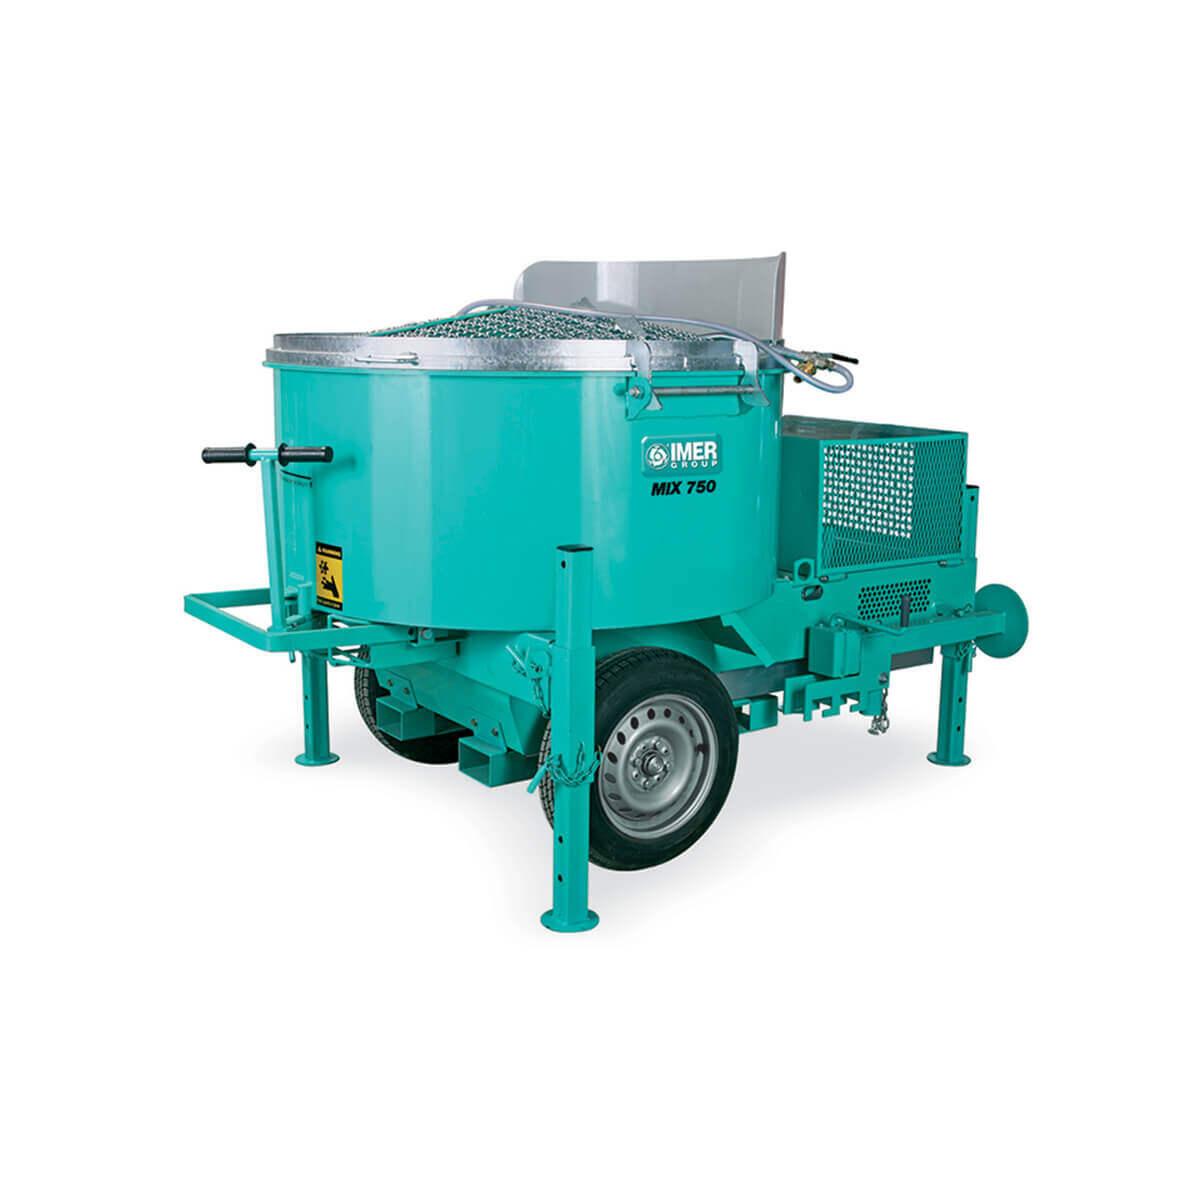 Imer Mortarman 750 Mixer electric mortar mixer mortar, dry pack, stucco, or sand & cement. Mix concrete